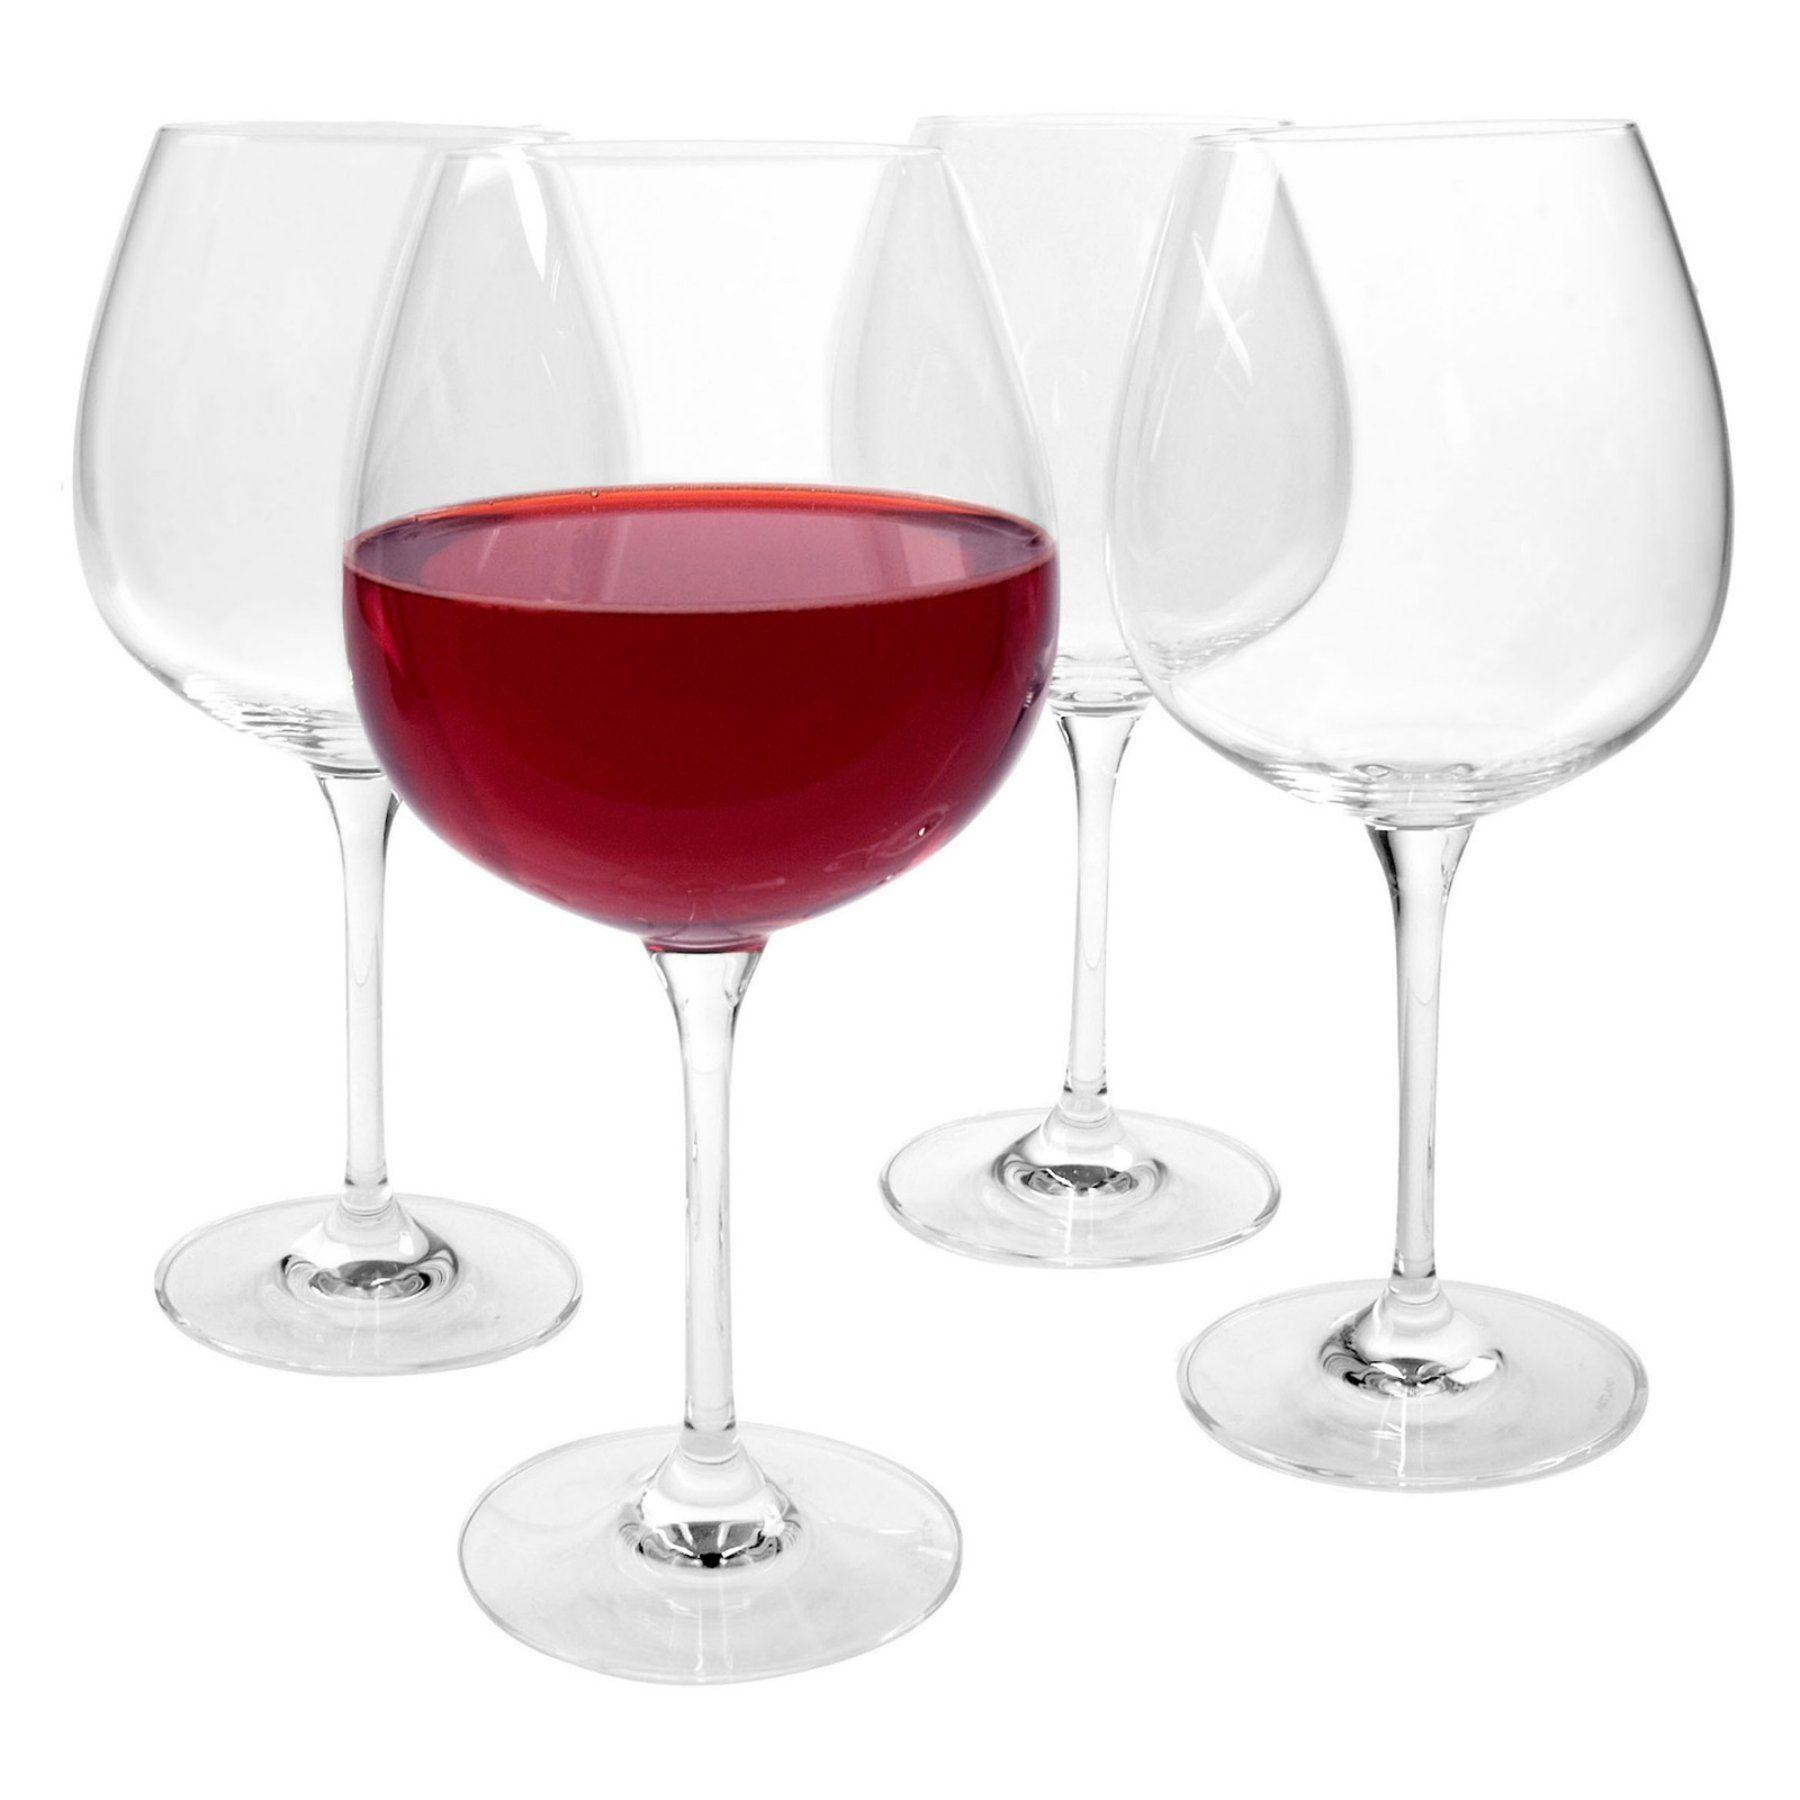 Artland Inc Veritas Burgundy Wine Glasses Set Of 4 66101a Products Wine Wine Glass Set Glass